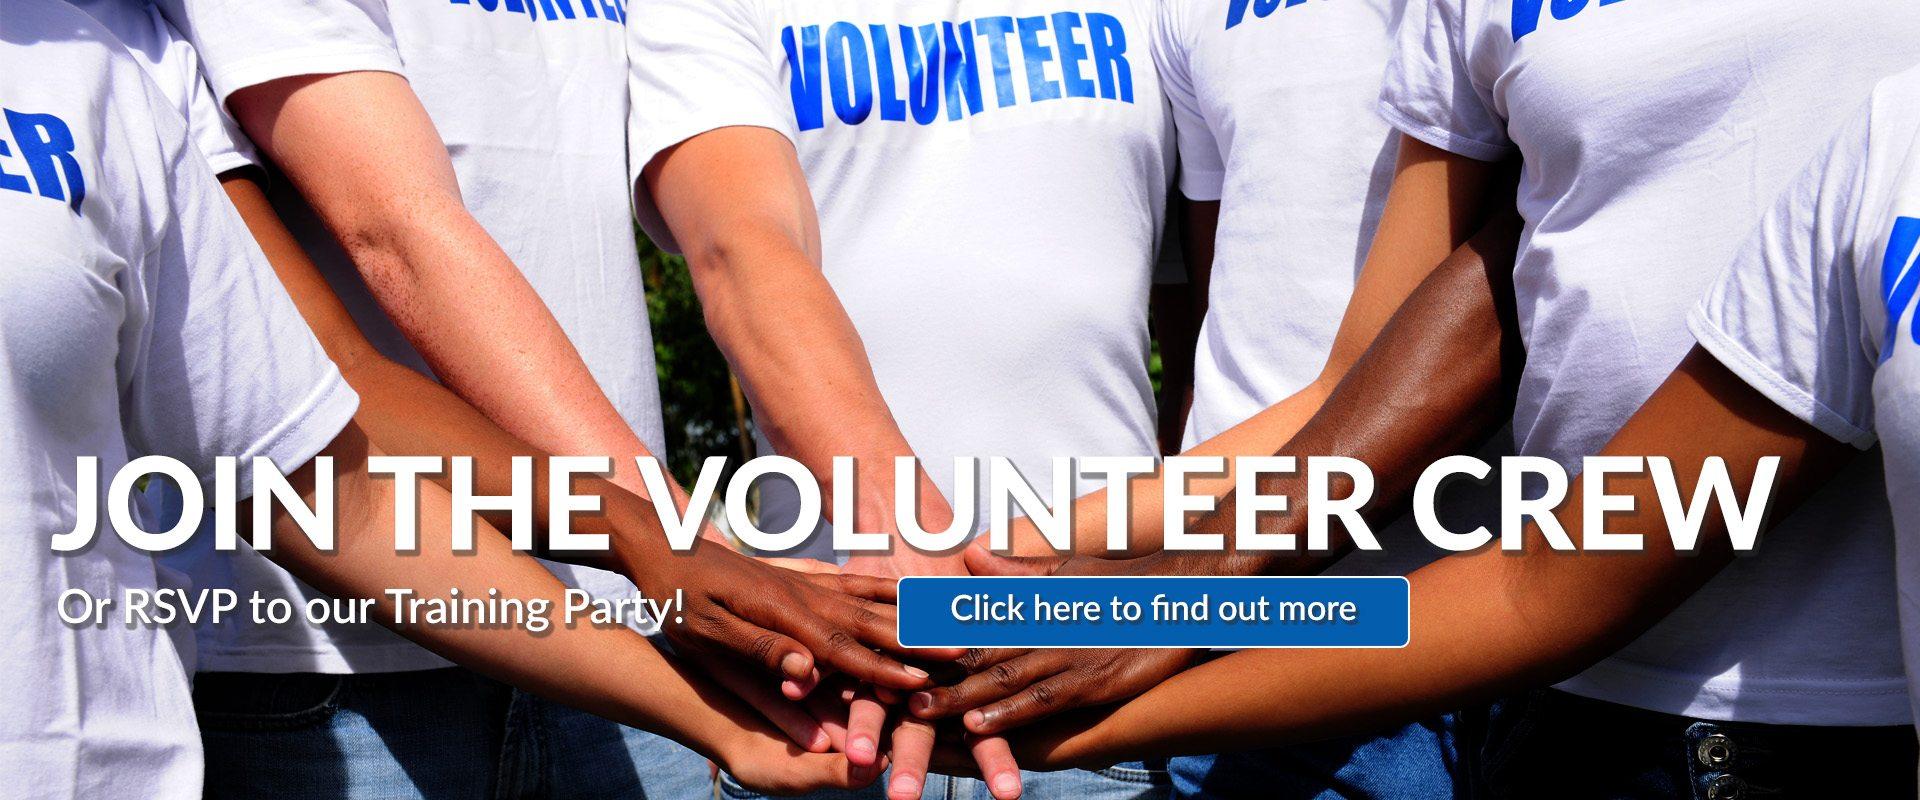 91.3 KGLY East Texas Christian Radio Volunteer Crew